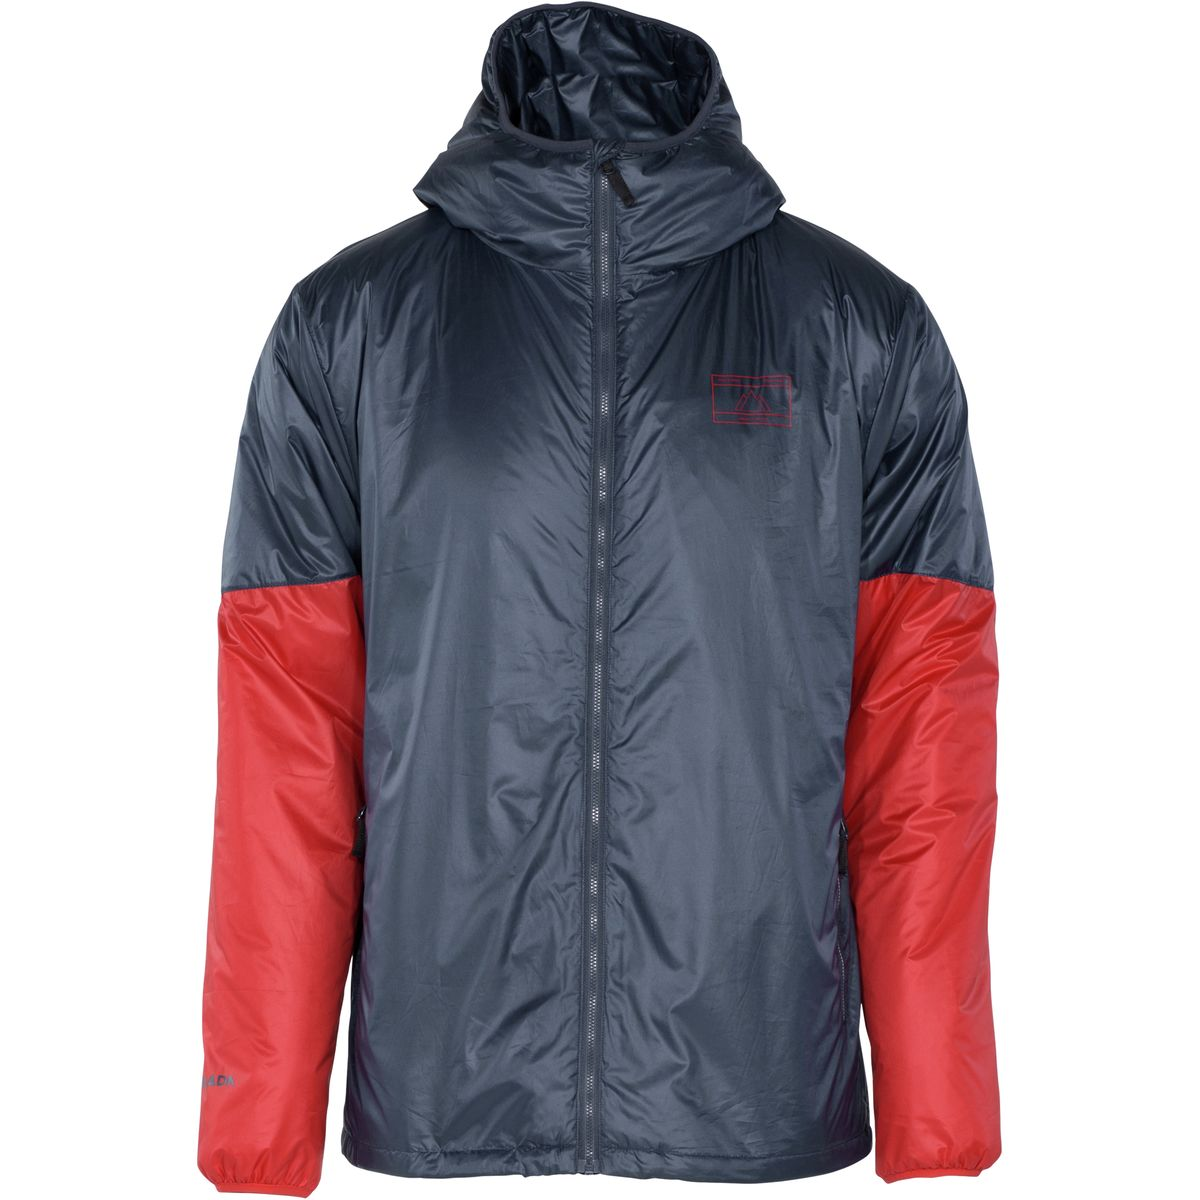 Armada Gremlin Primaloft Hooded Insulated Jacket - Men